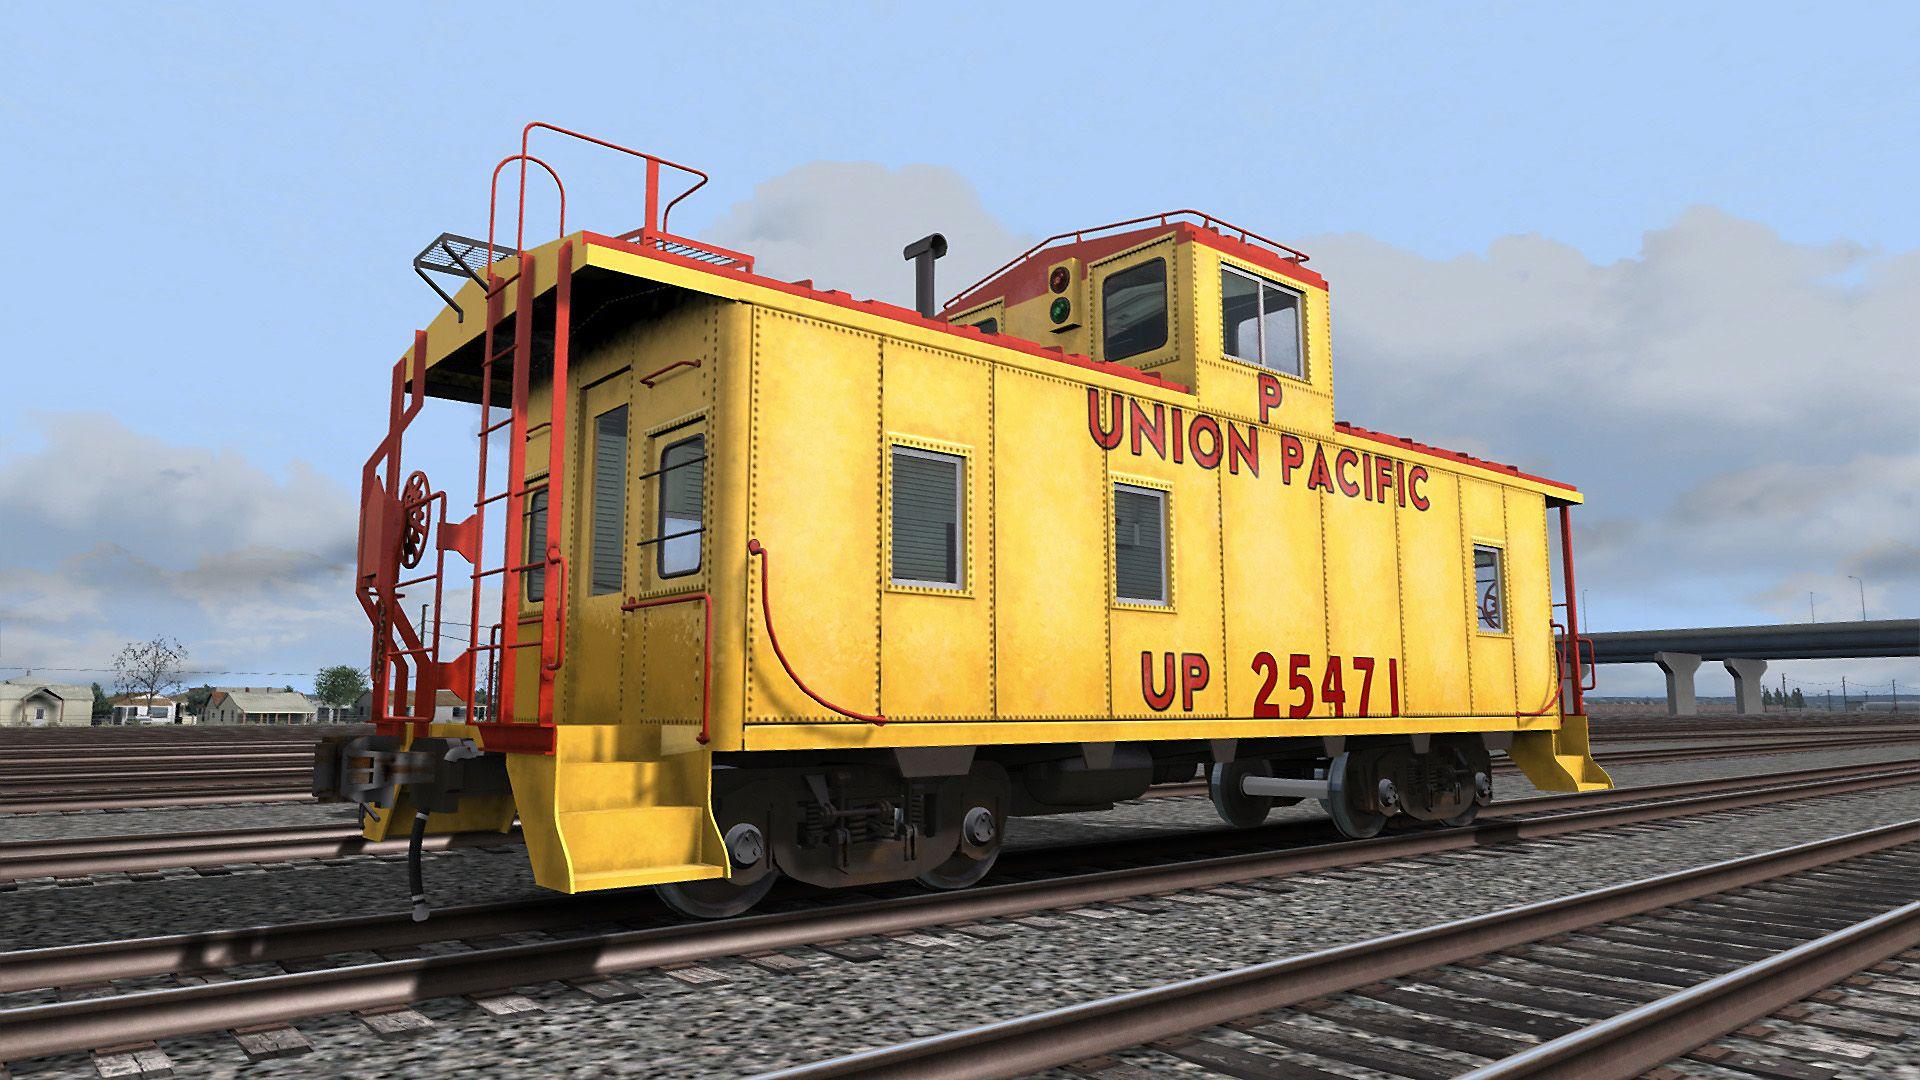 UP502